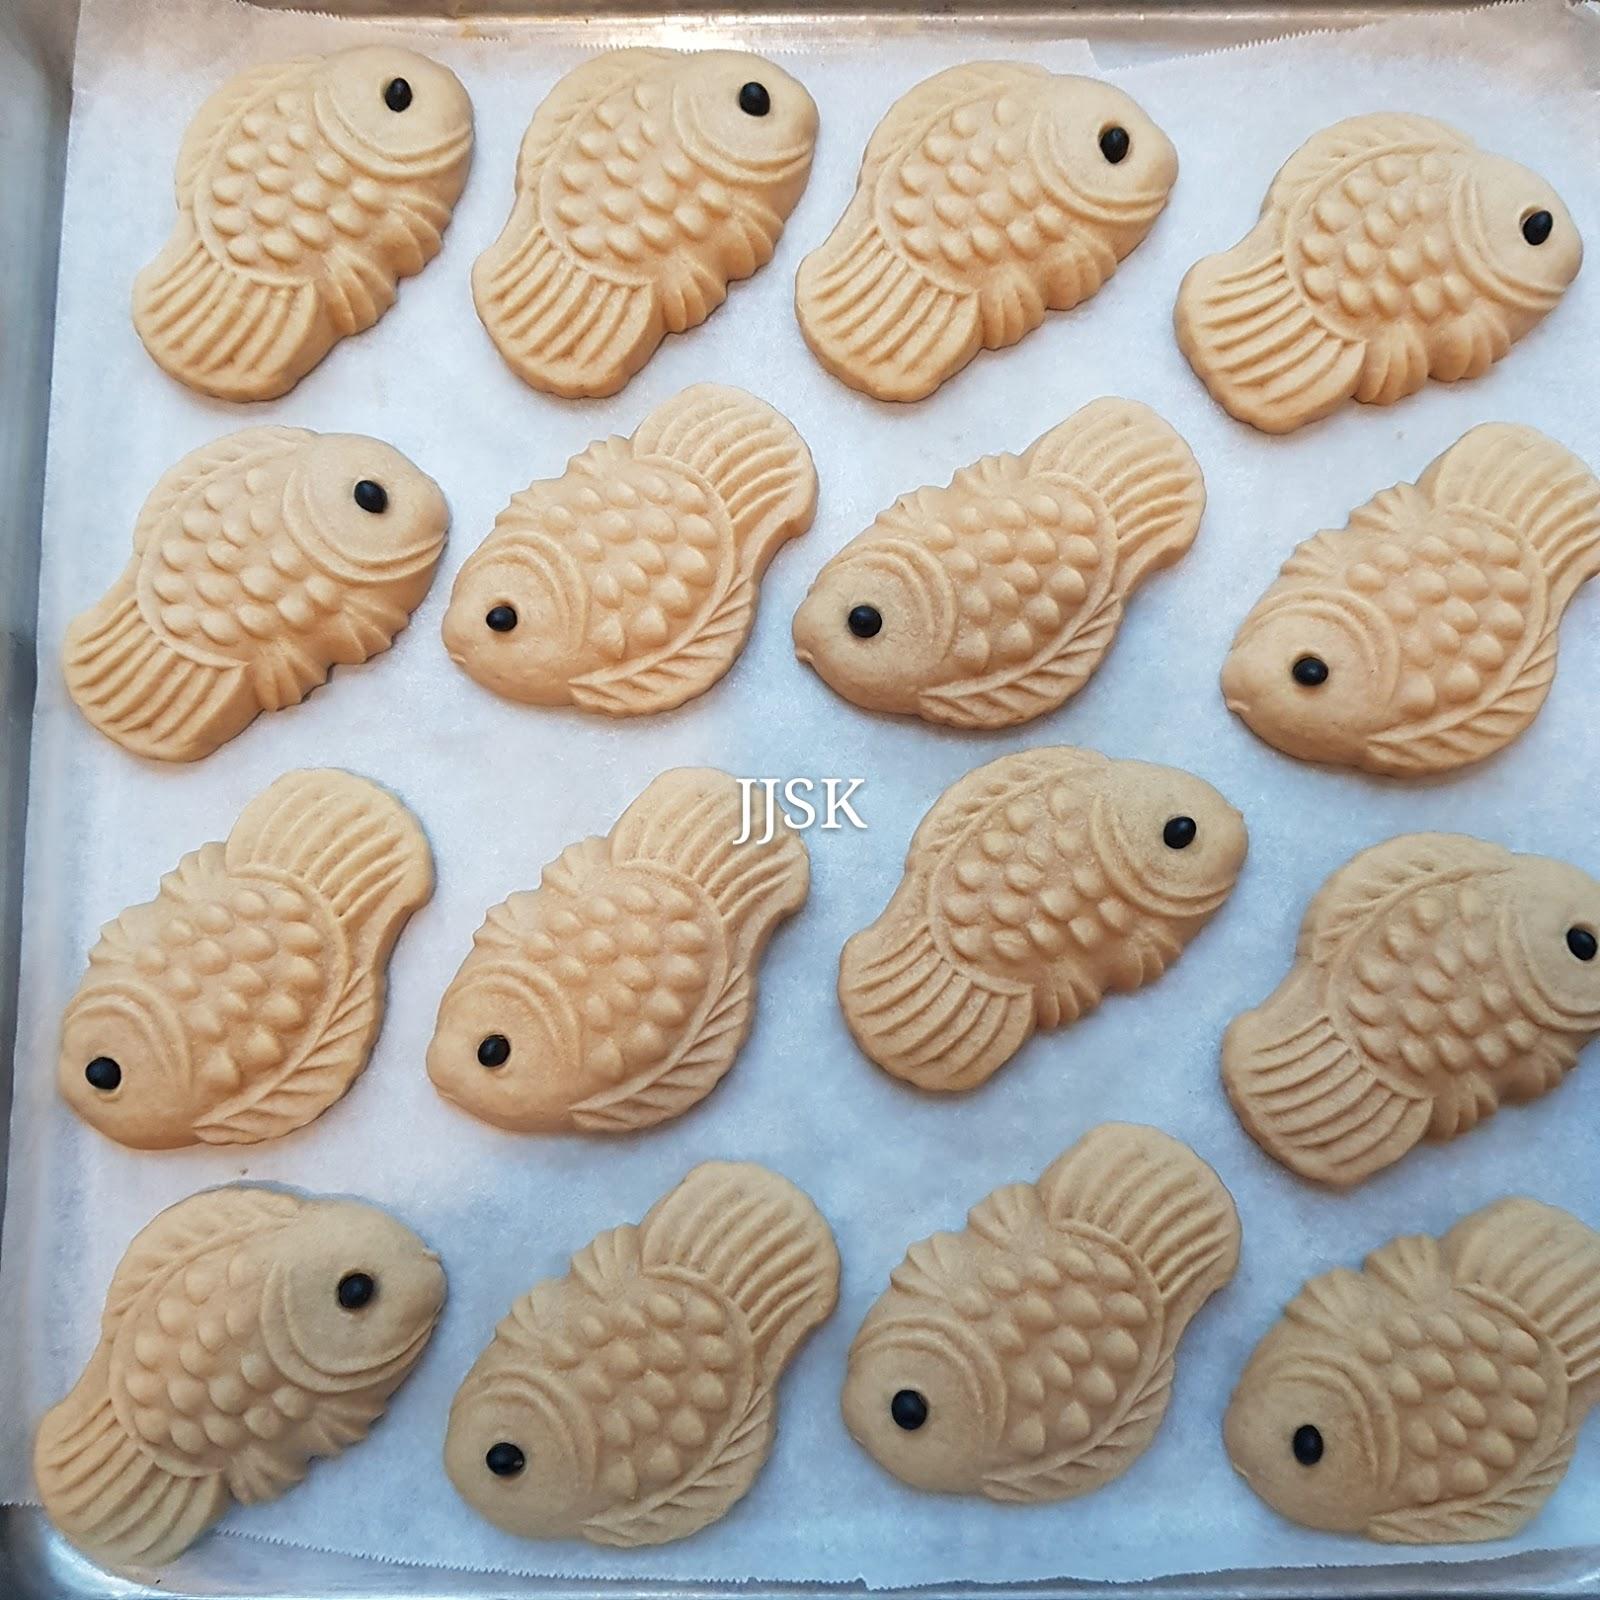 wood mode kitchens stand alone kitchen island 爱厨房的幸福之味: 原味公仔饼(鱼) original taste gong zai bing(fish)